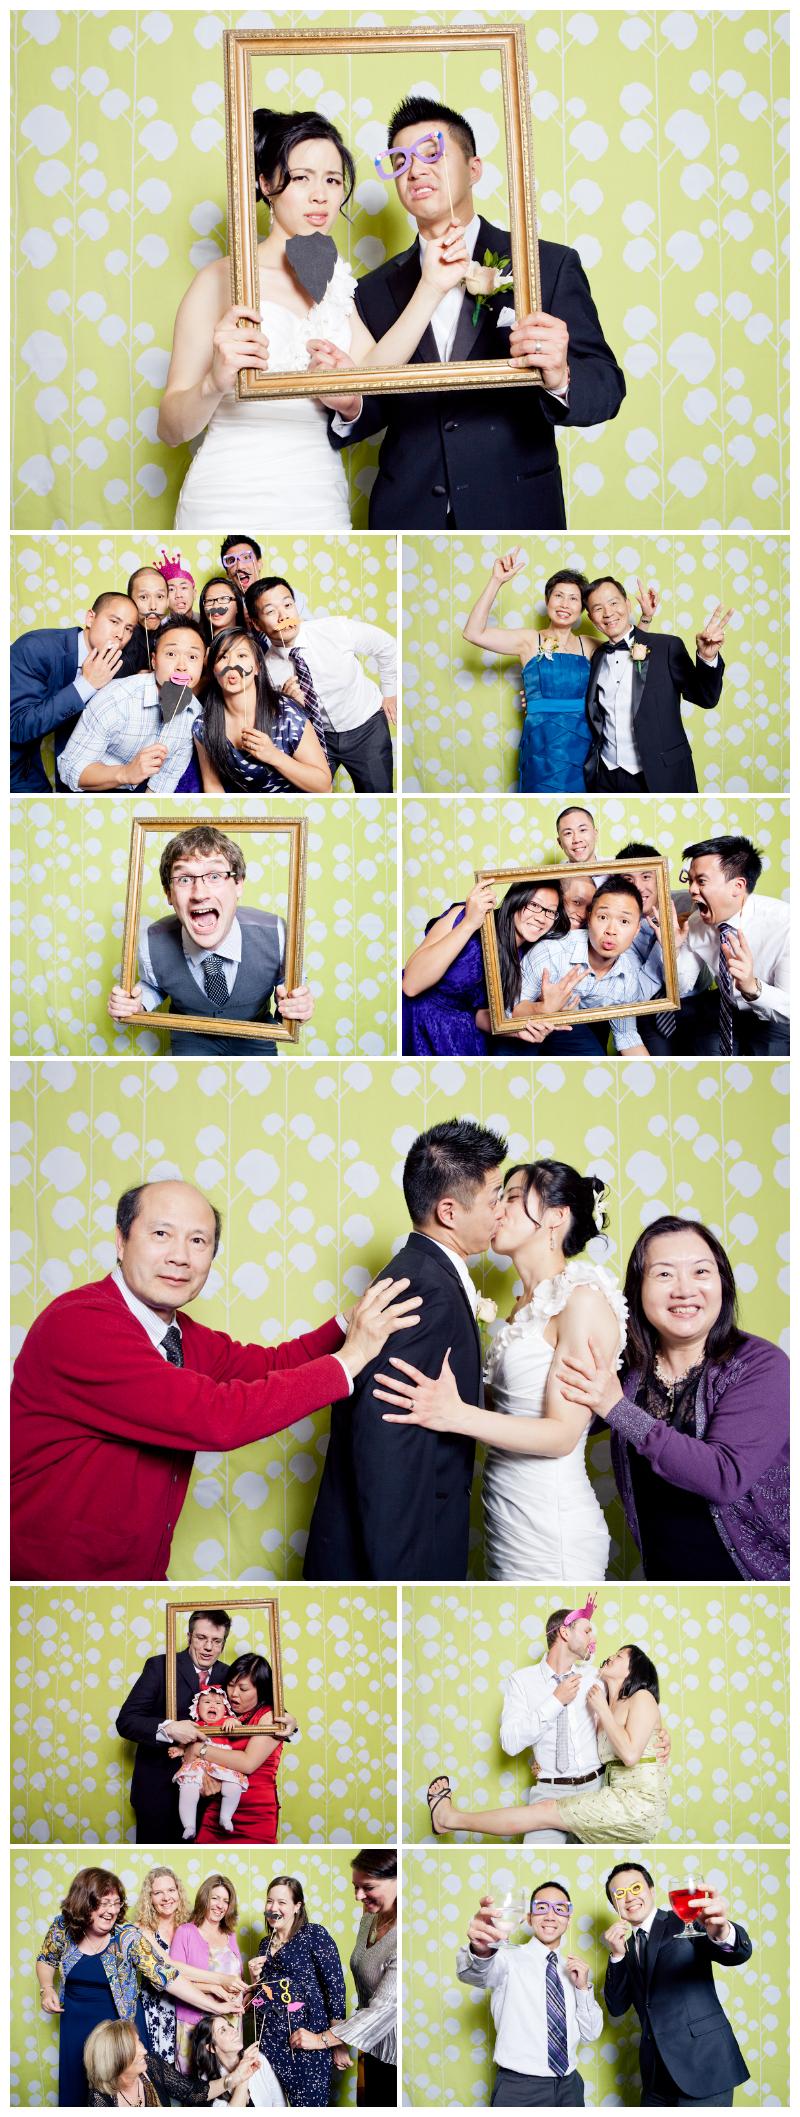 photobooth, wedding, wedding photos, wedding photobooth, sage bistro, UBC, vancouver